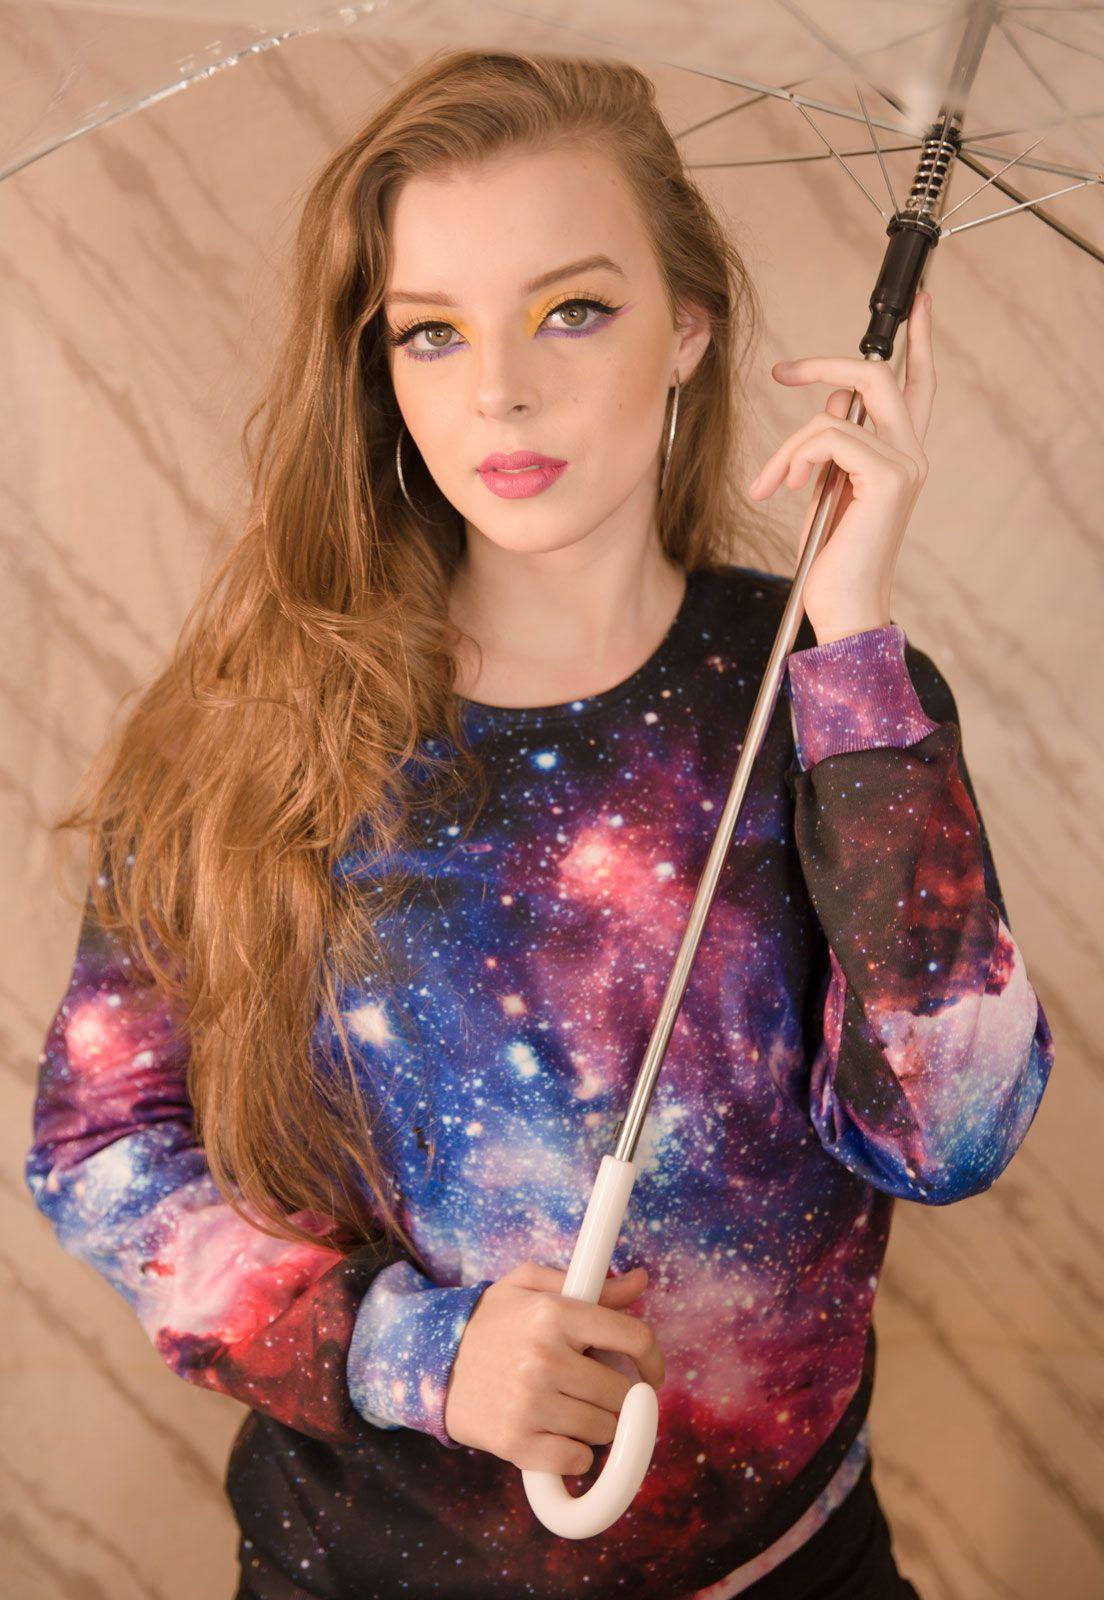 Blusa Moletom Galaxy Estampado Full Print Unissex Espaço Roupas Tumblr